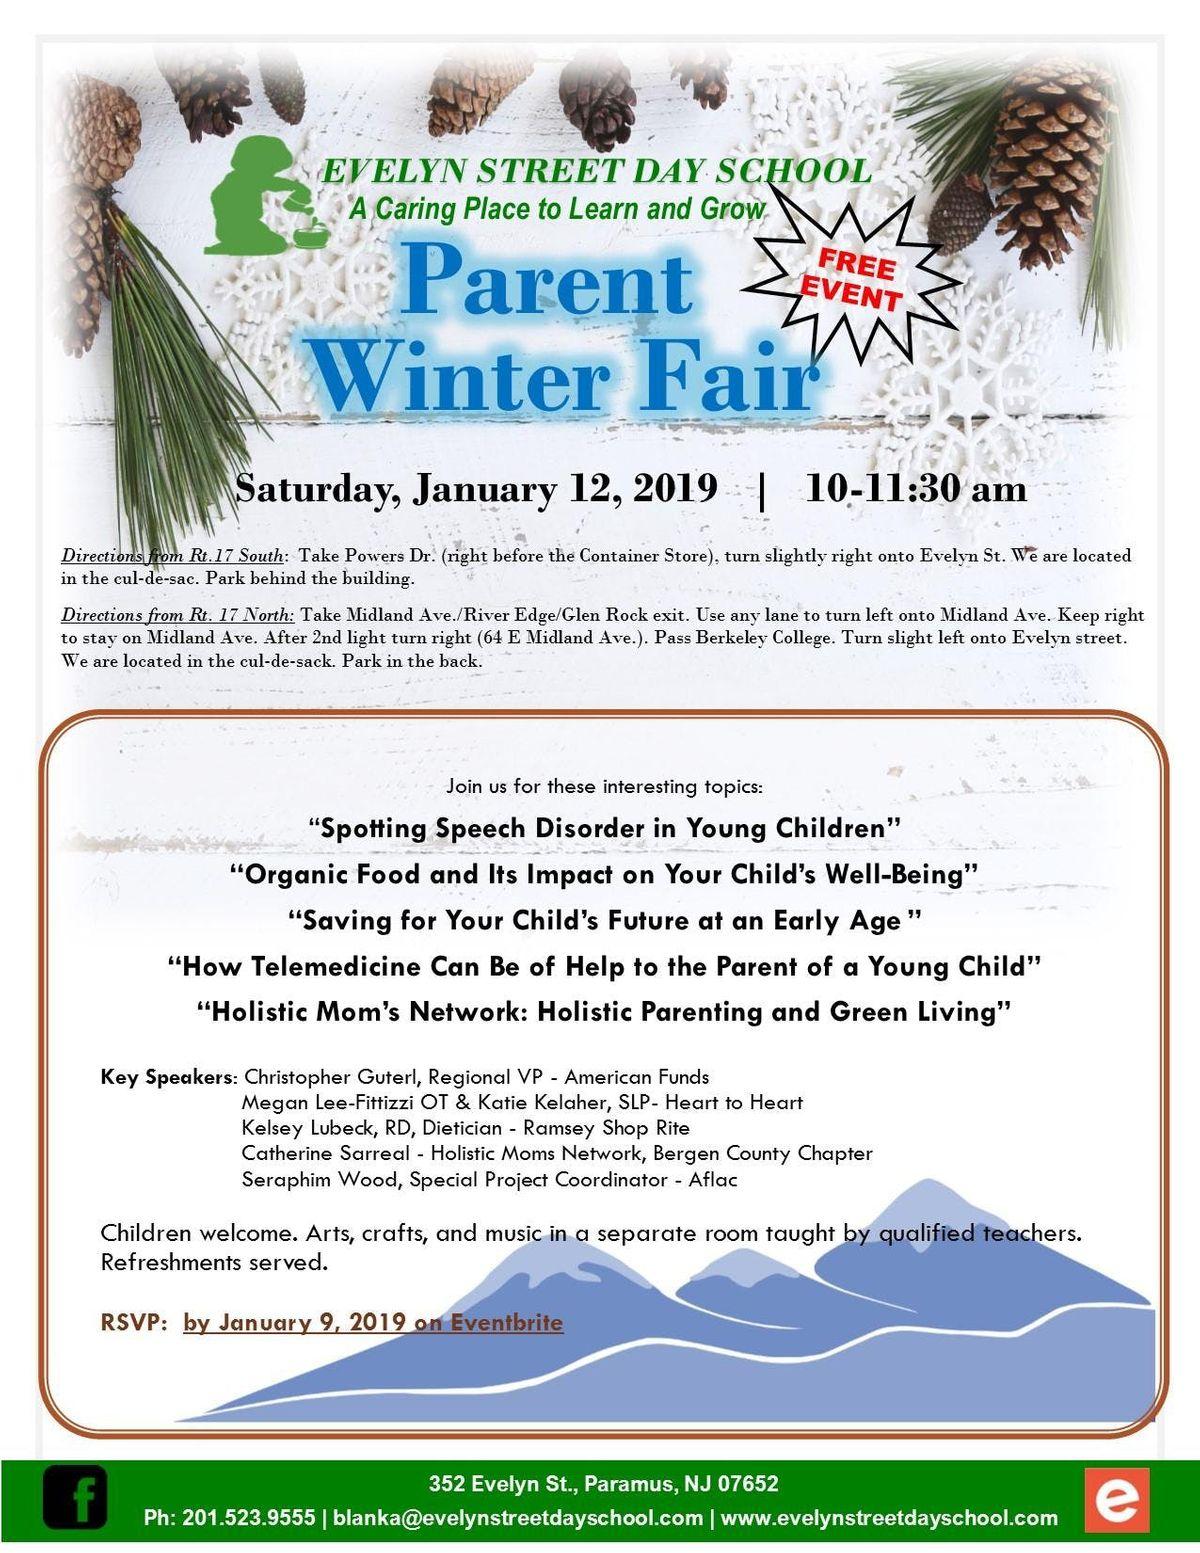 Winter Parent Fair at 352 Evelyn St, Paramus